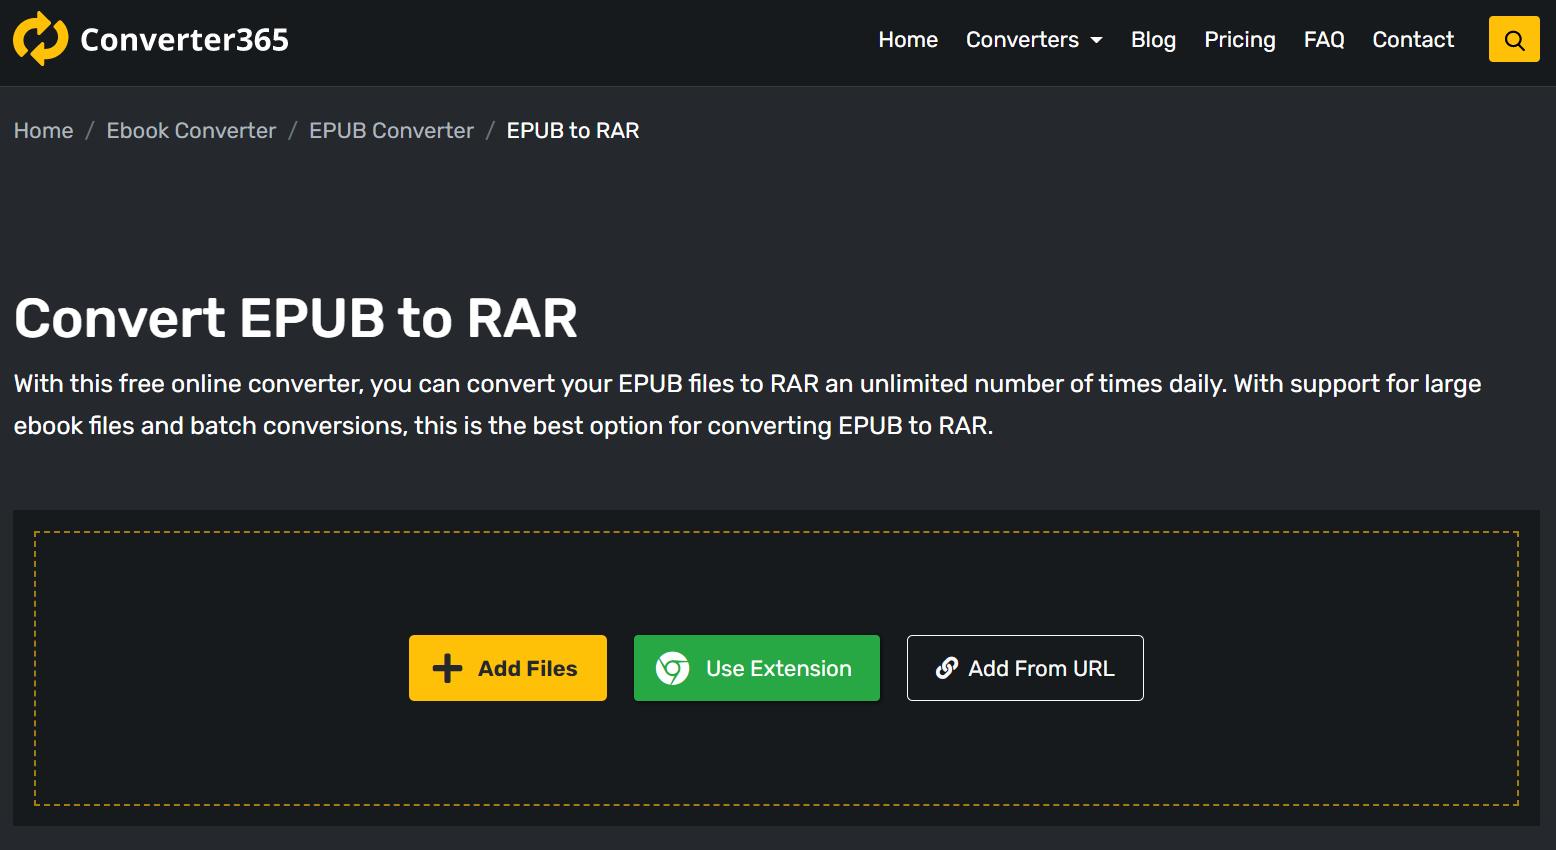 How to convert EPUB to RAR files?